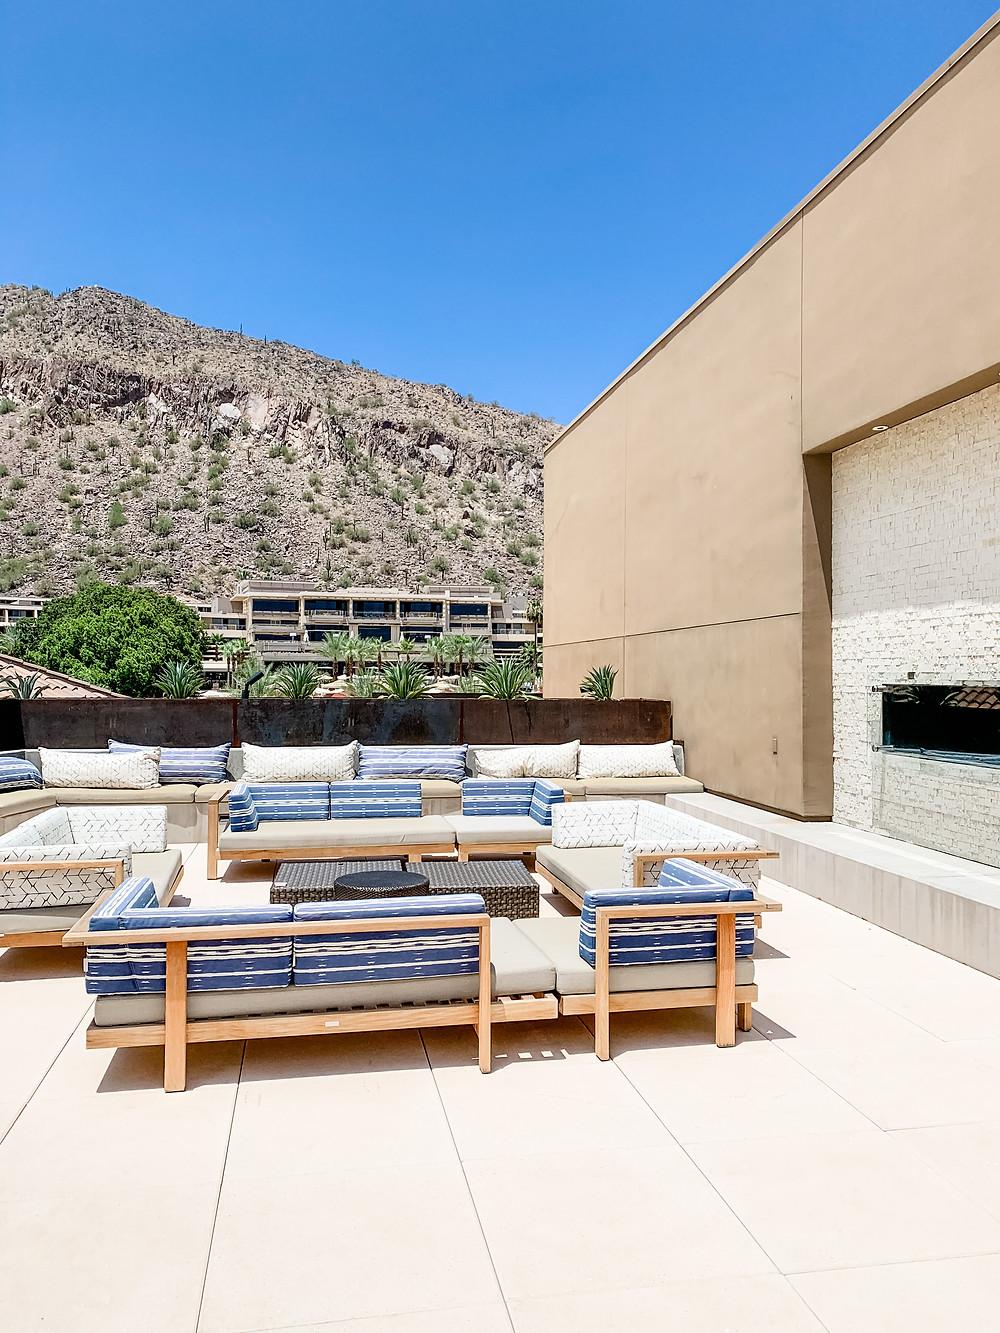 The Phoenician Resort Scottsdale Arizona Spa Rooftop Pool Overlooking Camelback Mountain